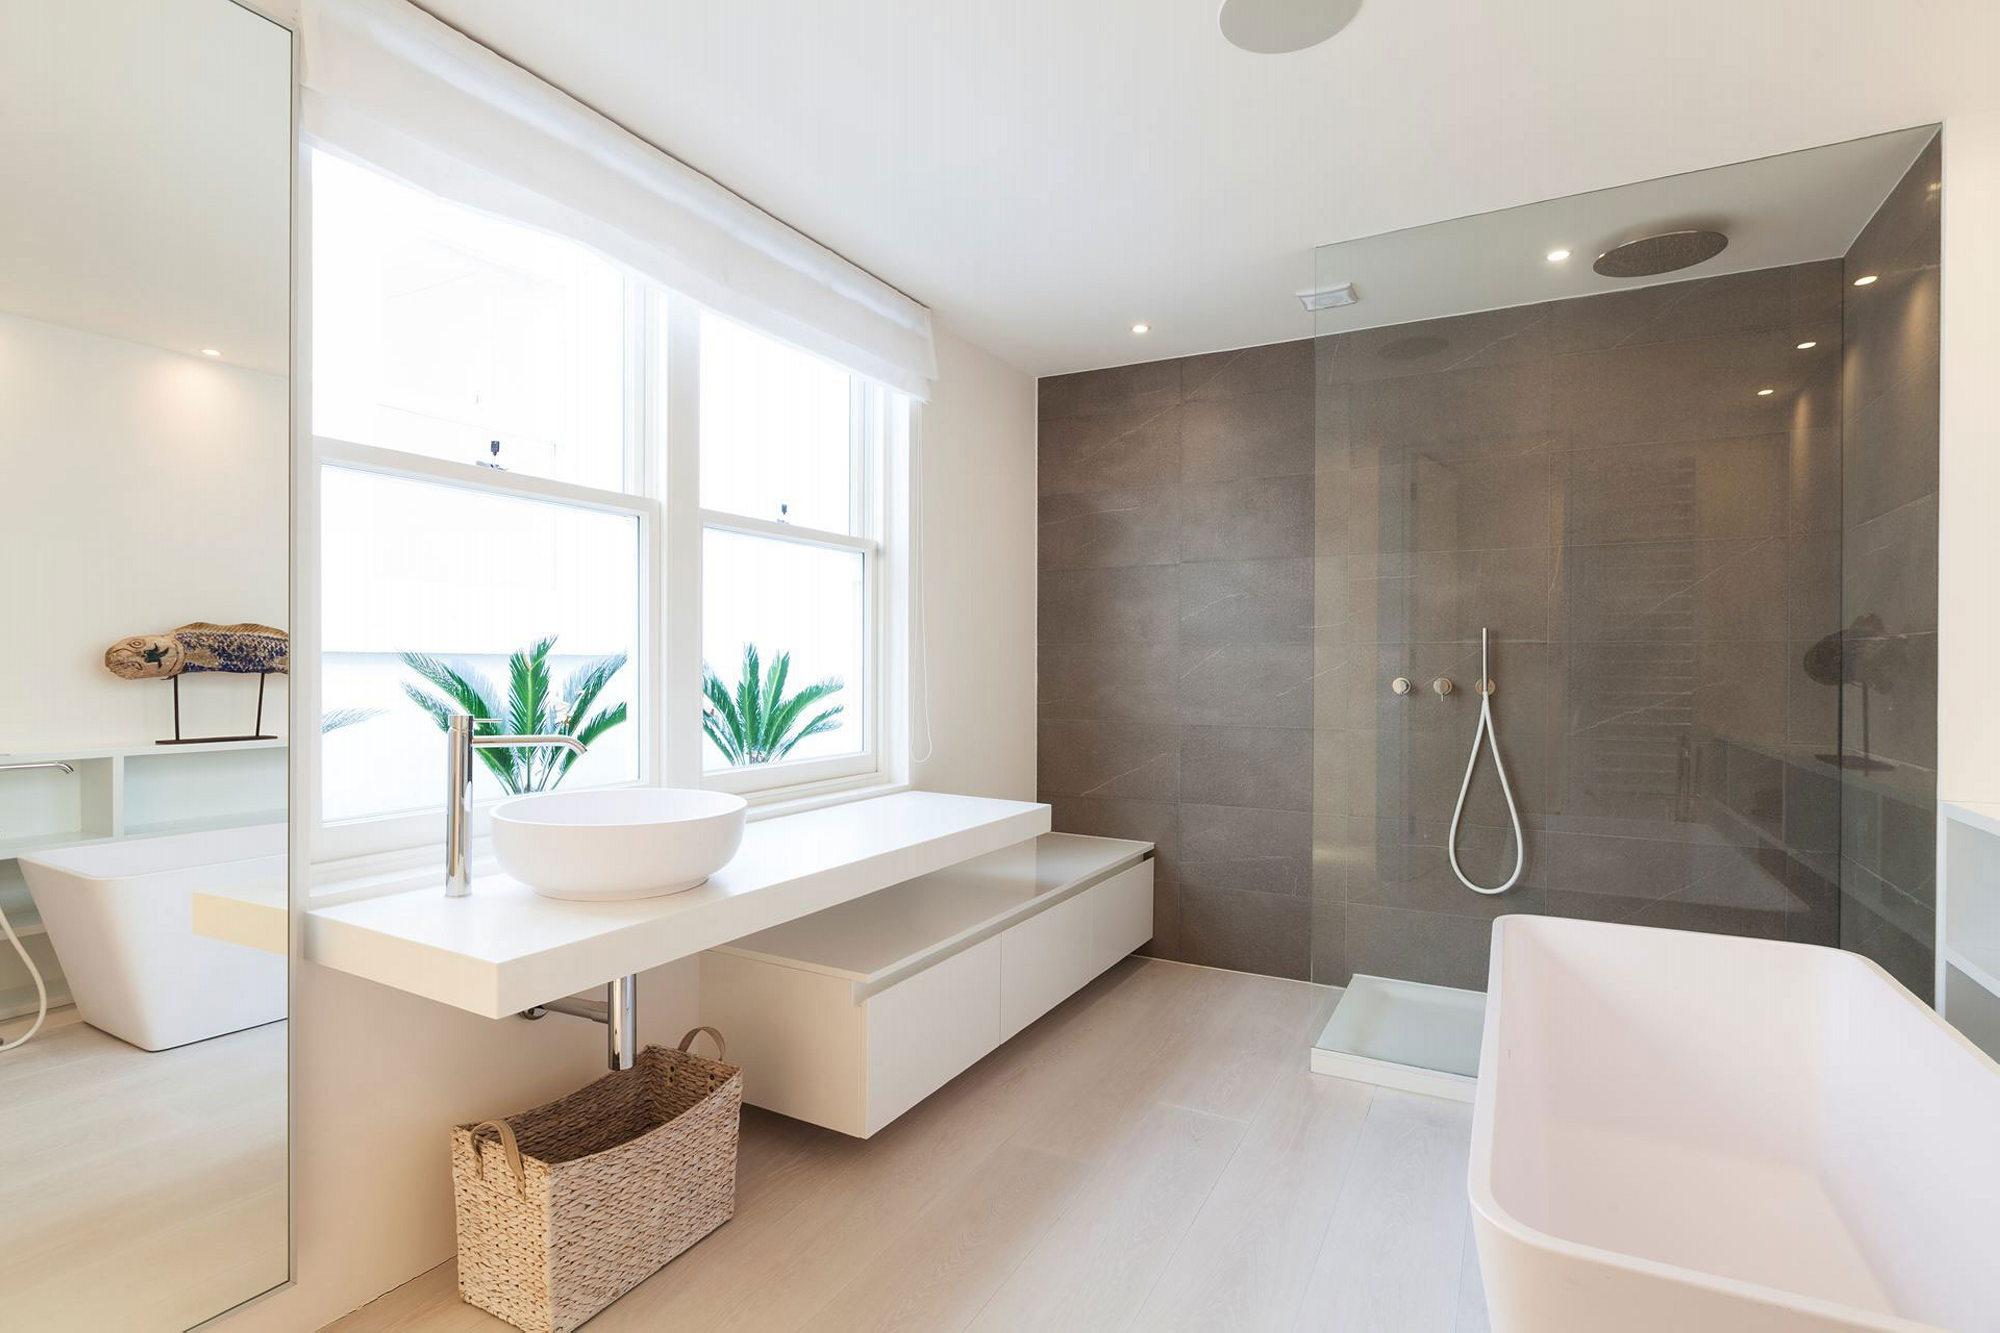 St petersburg place penthouse in london england - Badkamer mansard ...